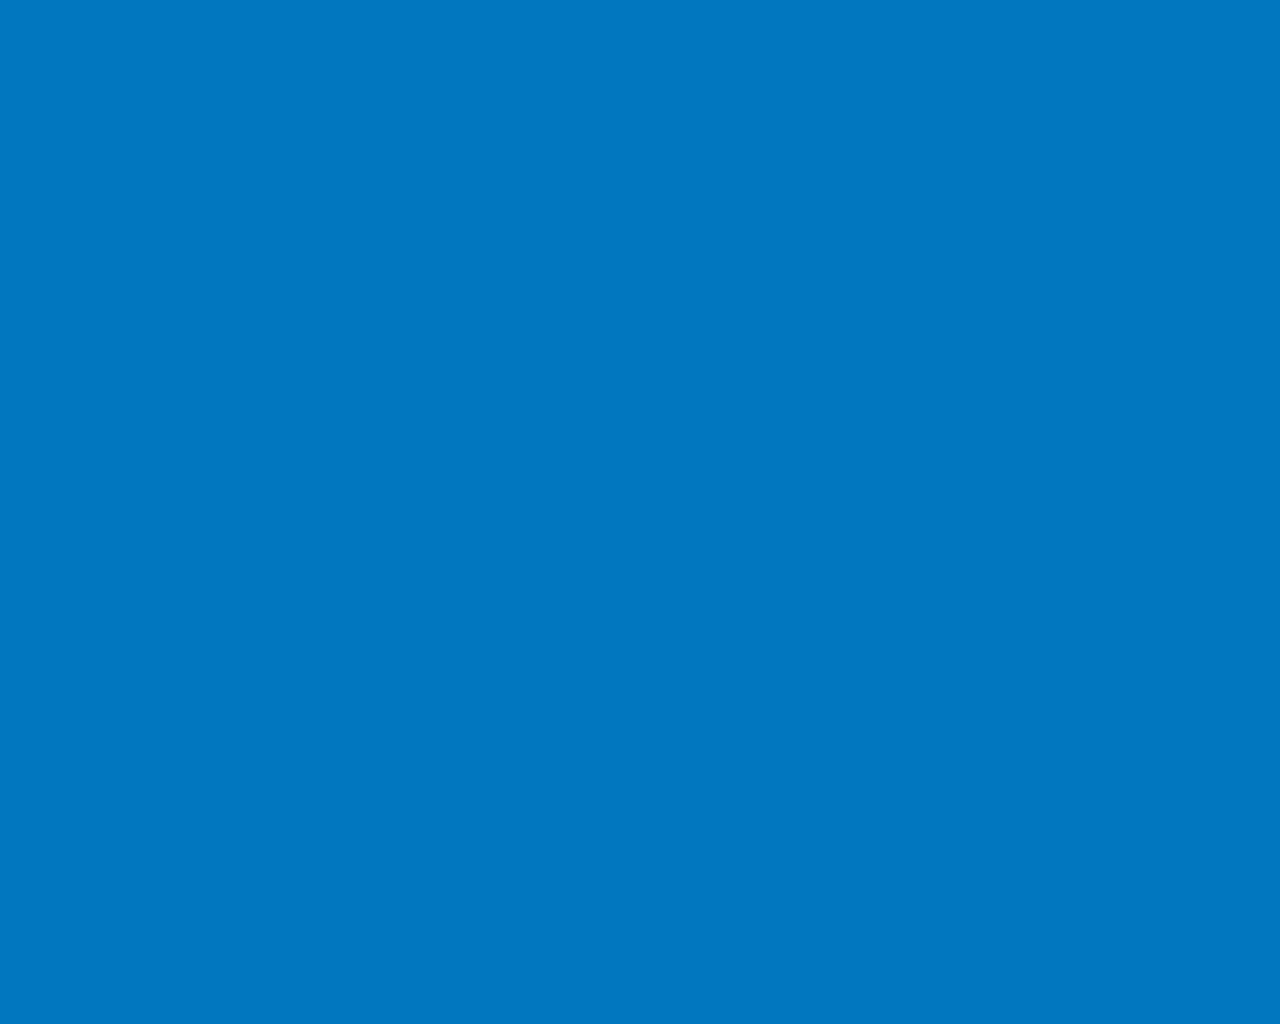 1280x1024 Ocean Boat Blue Solid Color Background